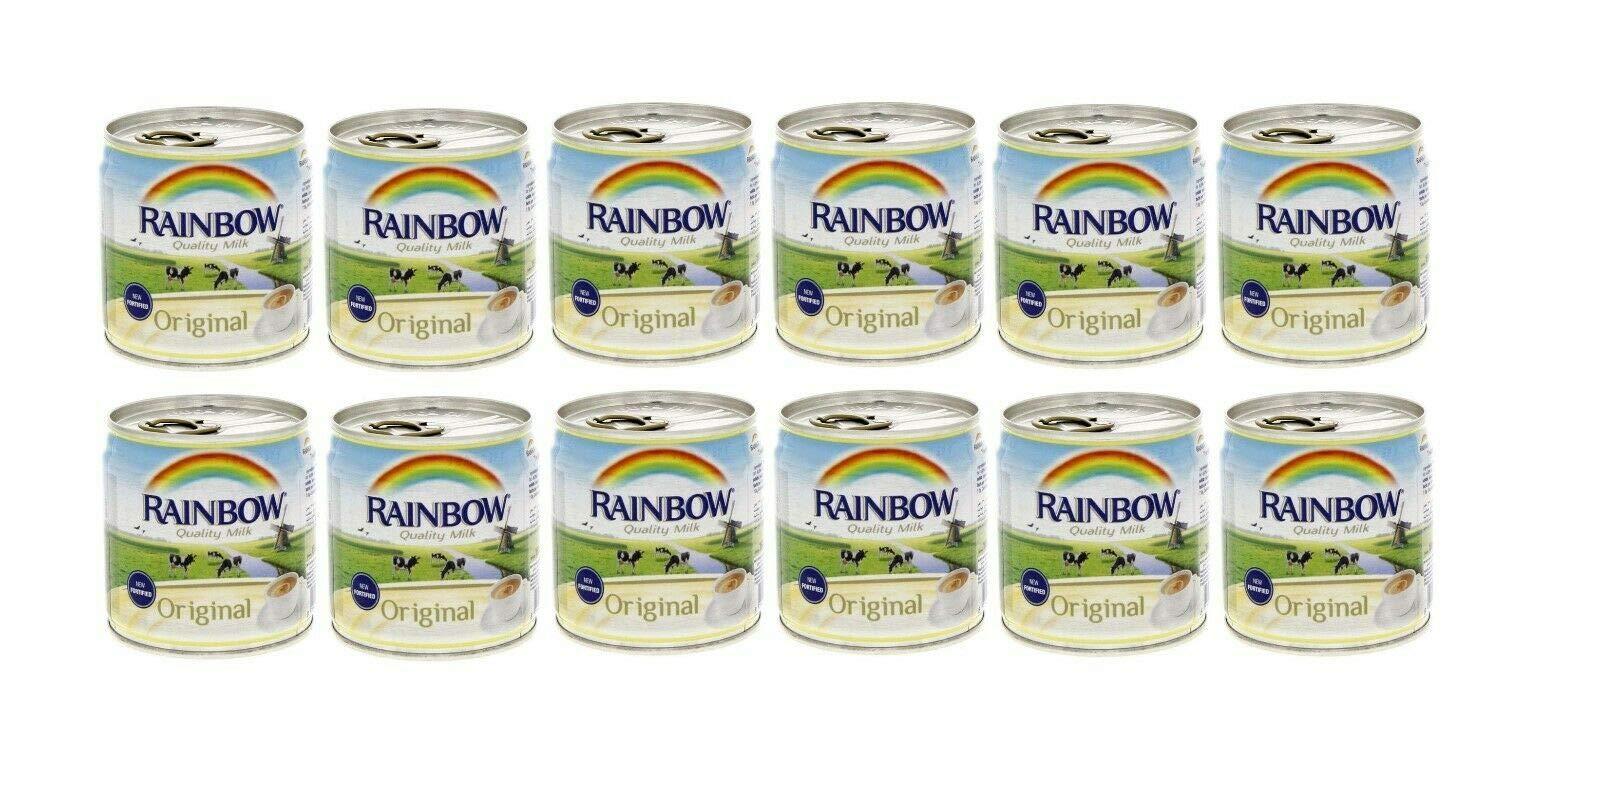 Rainbow Evaporated Milk Full Cream Sterilized 6oz. 170gm each 12 Cans حليب أبو قوس مبخر كامل الدسم افضل صديق للشاي by Al Amin